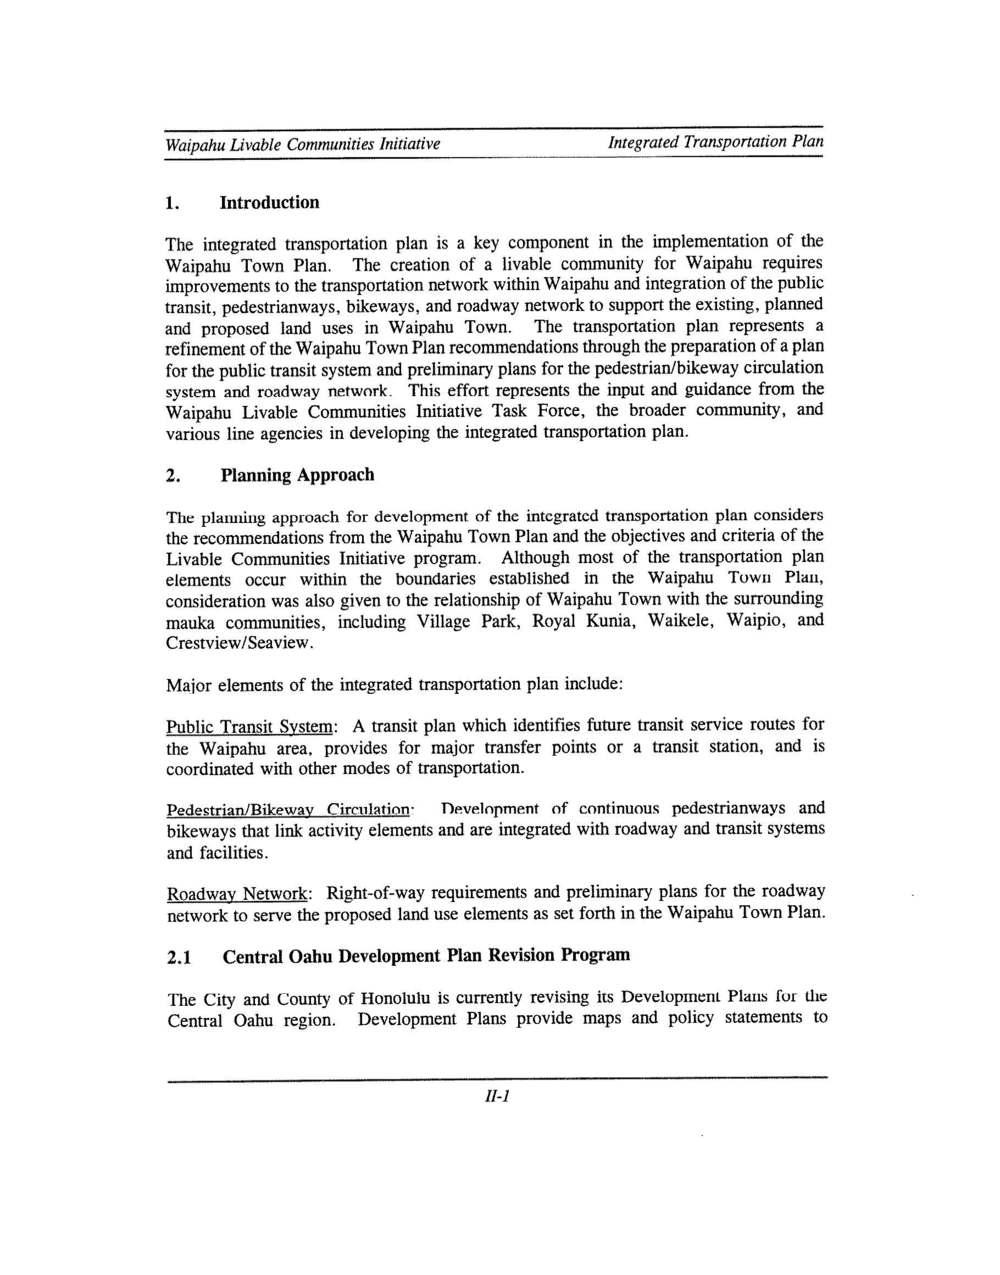 160531_WaipahuLivableCommunities(1998)_Page_016.jpg